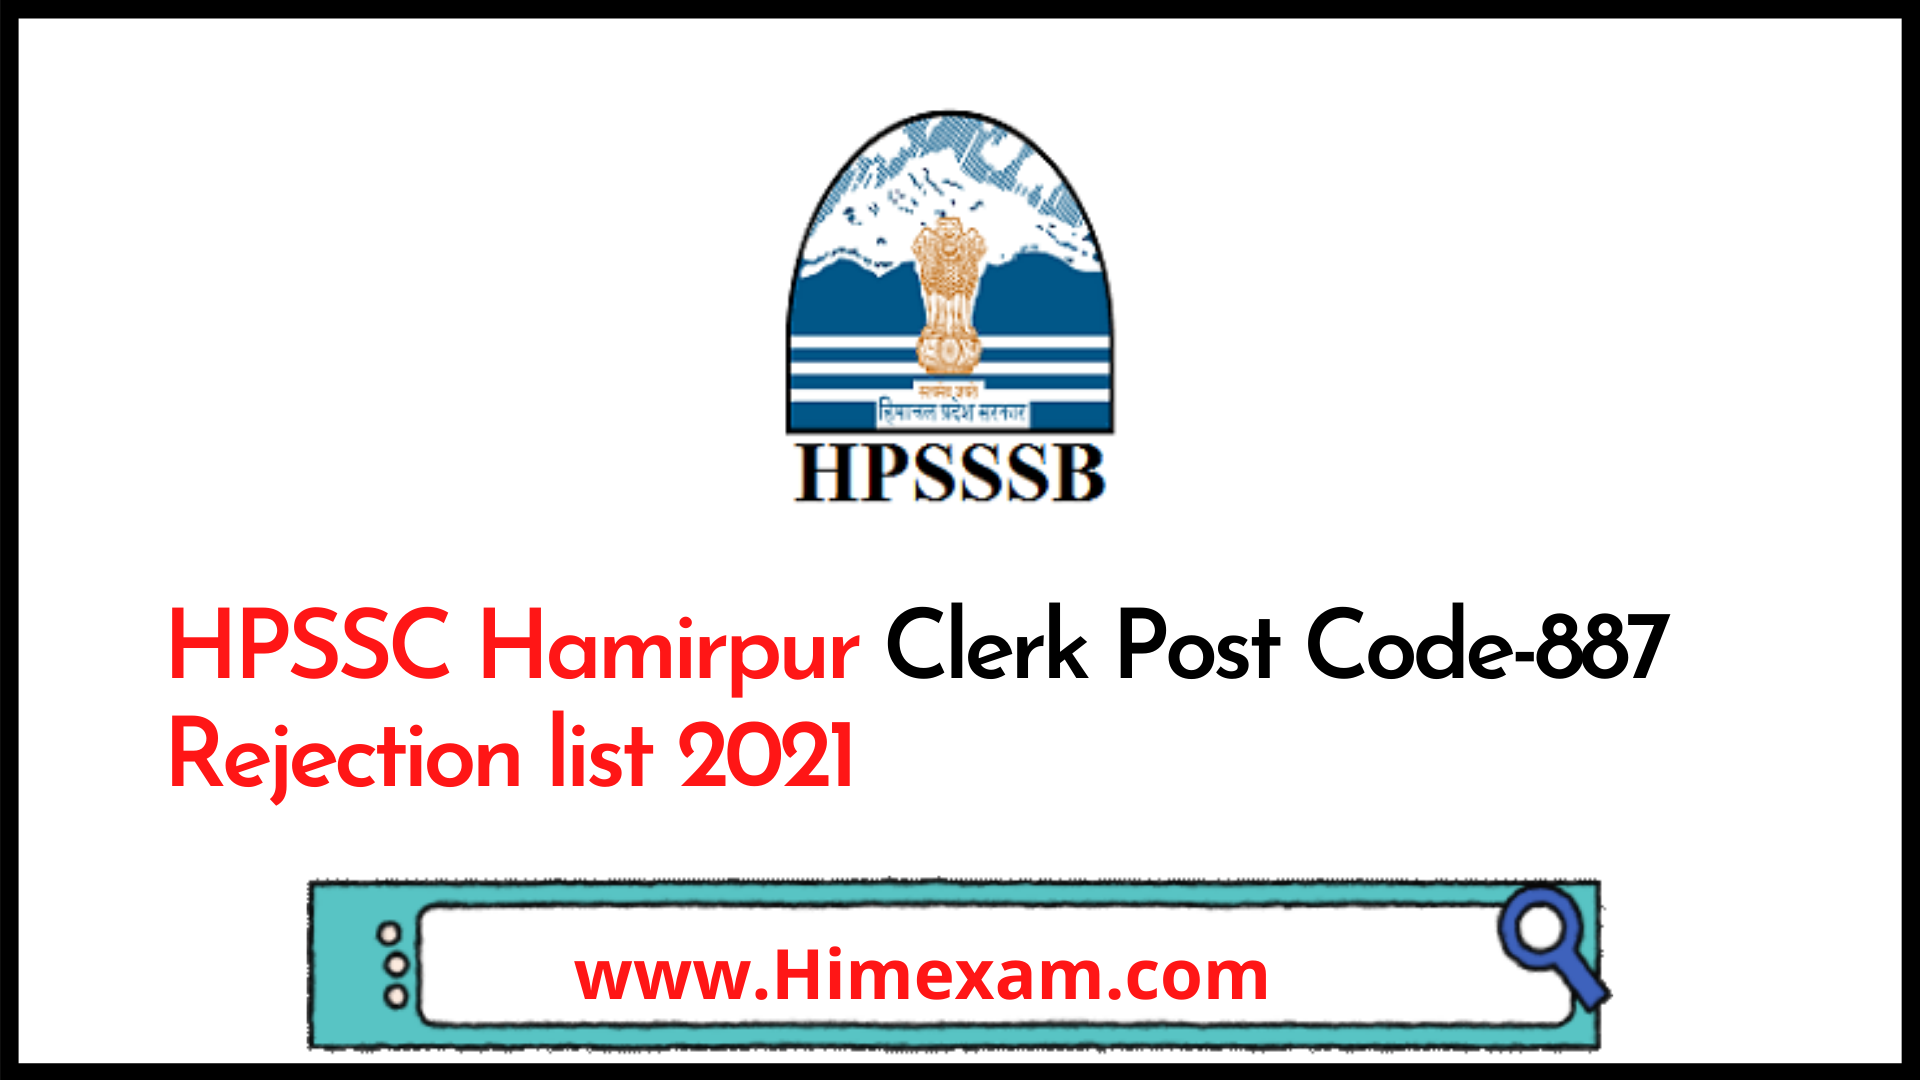 HPSSC Hamirpur Clerk Post Code-887 Rejection list 2021